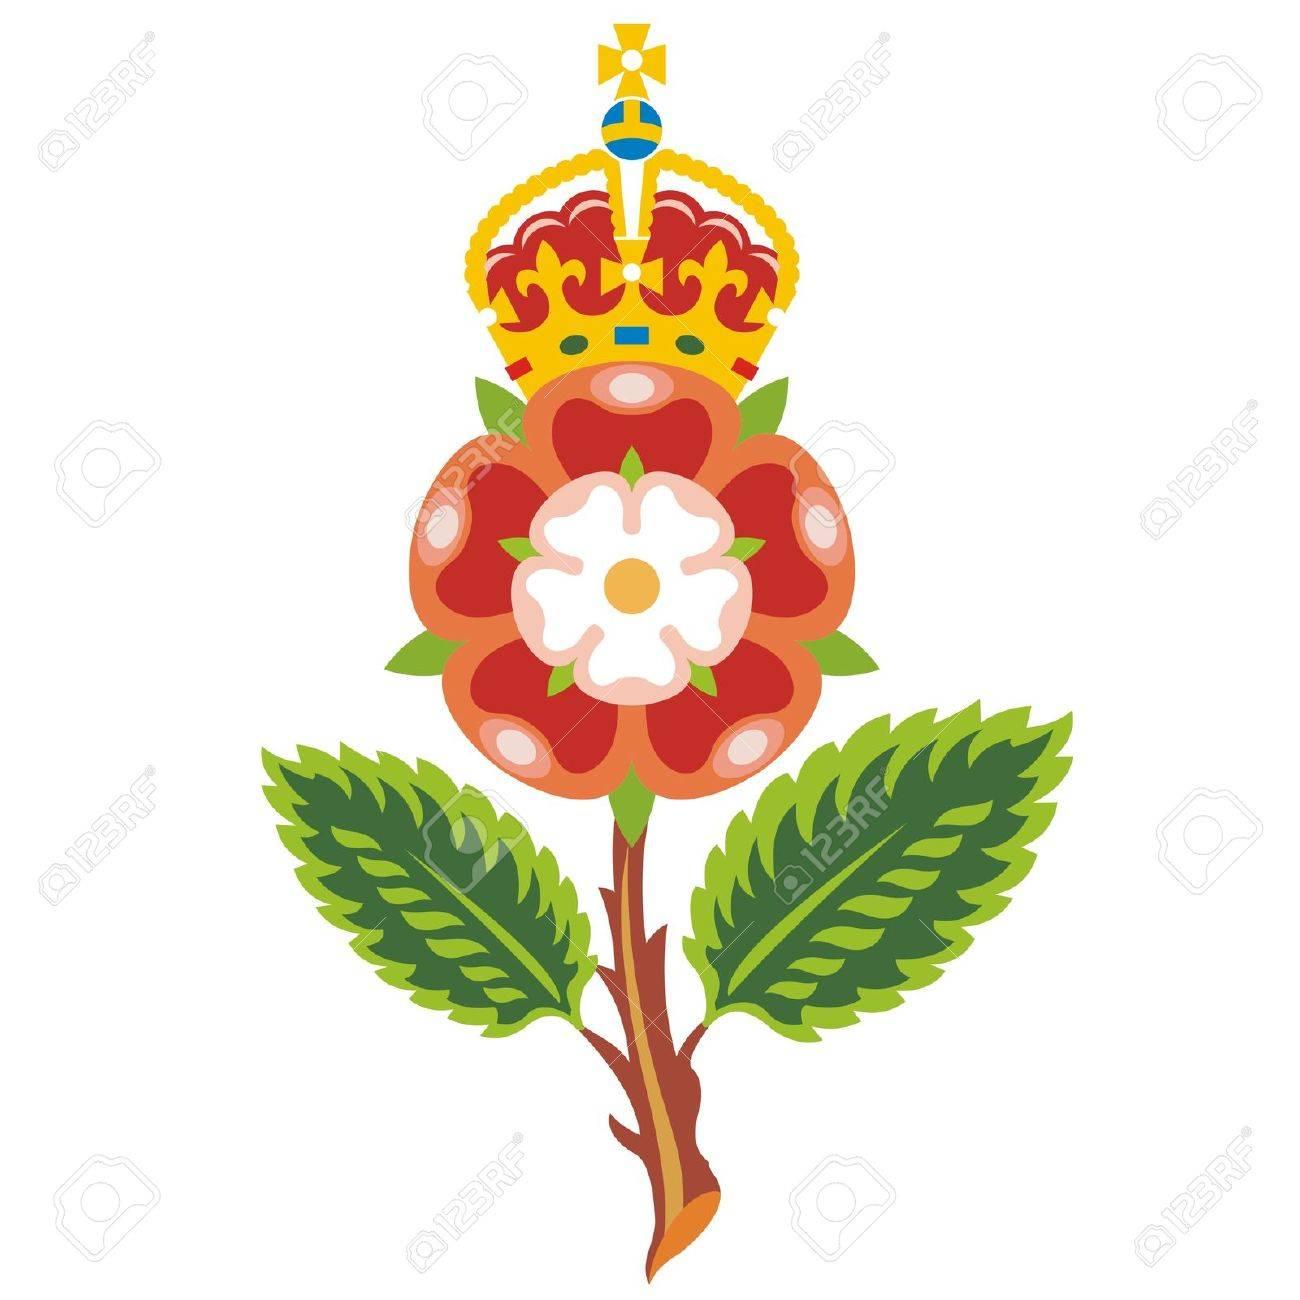 Tudor rose royal badge of england vector royalty free cliparts tudor rose royal badge of england vector stock vector 24805648 buycottarizona